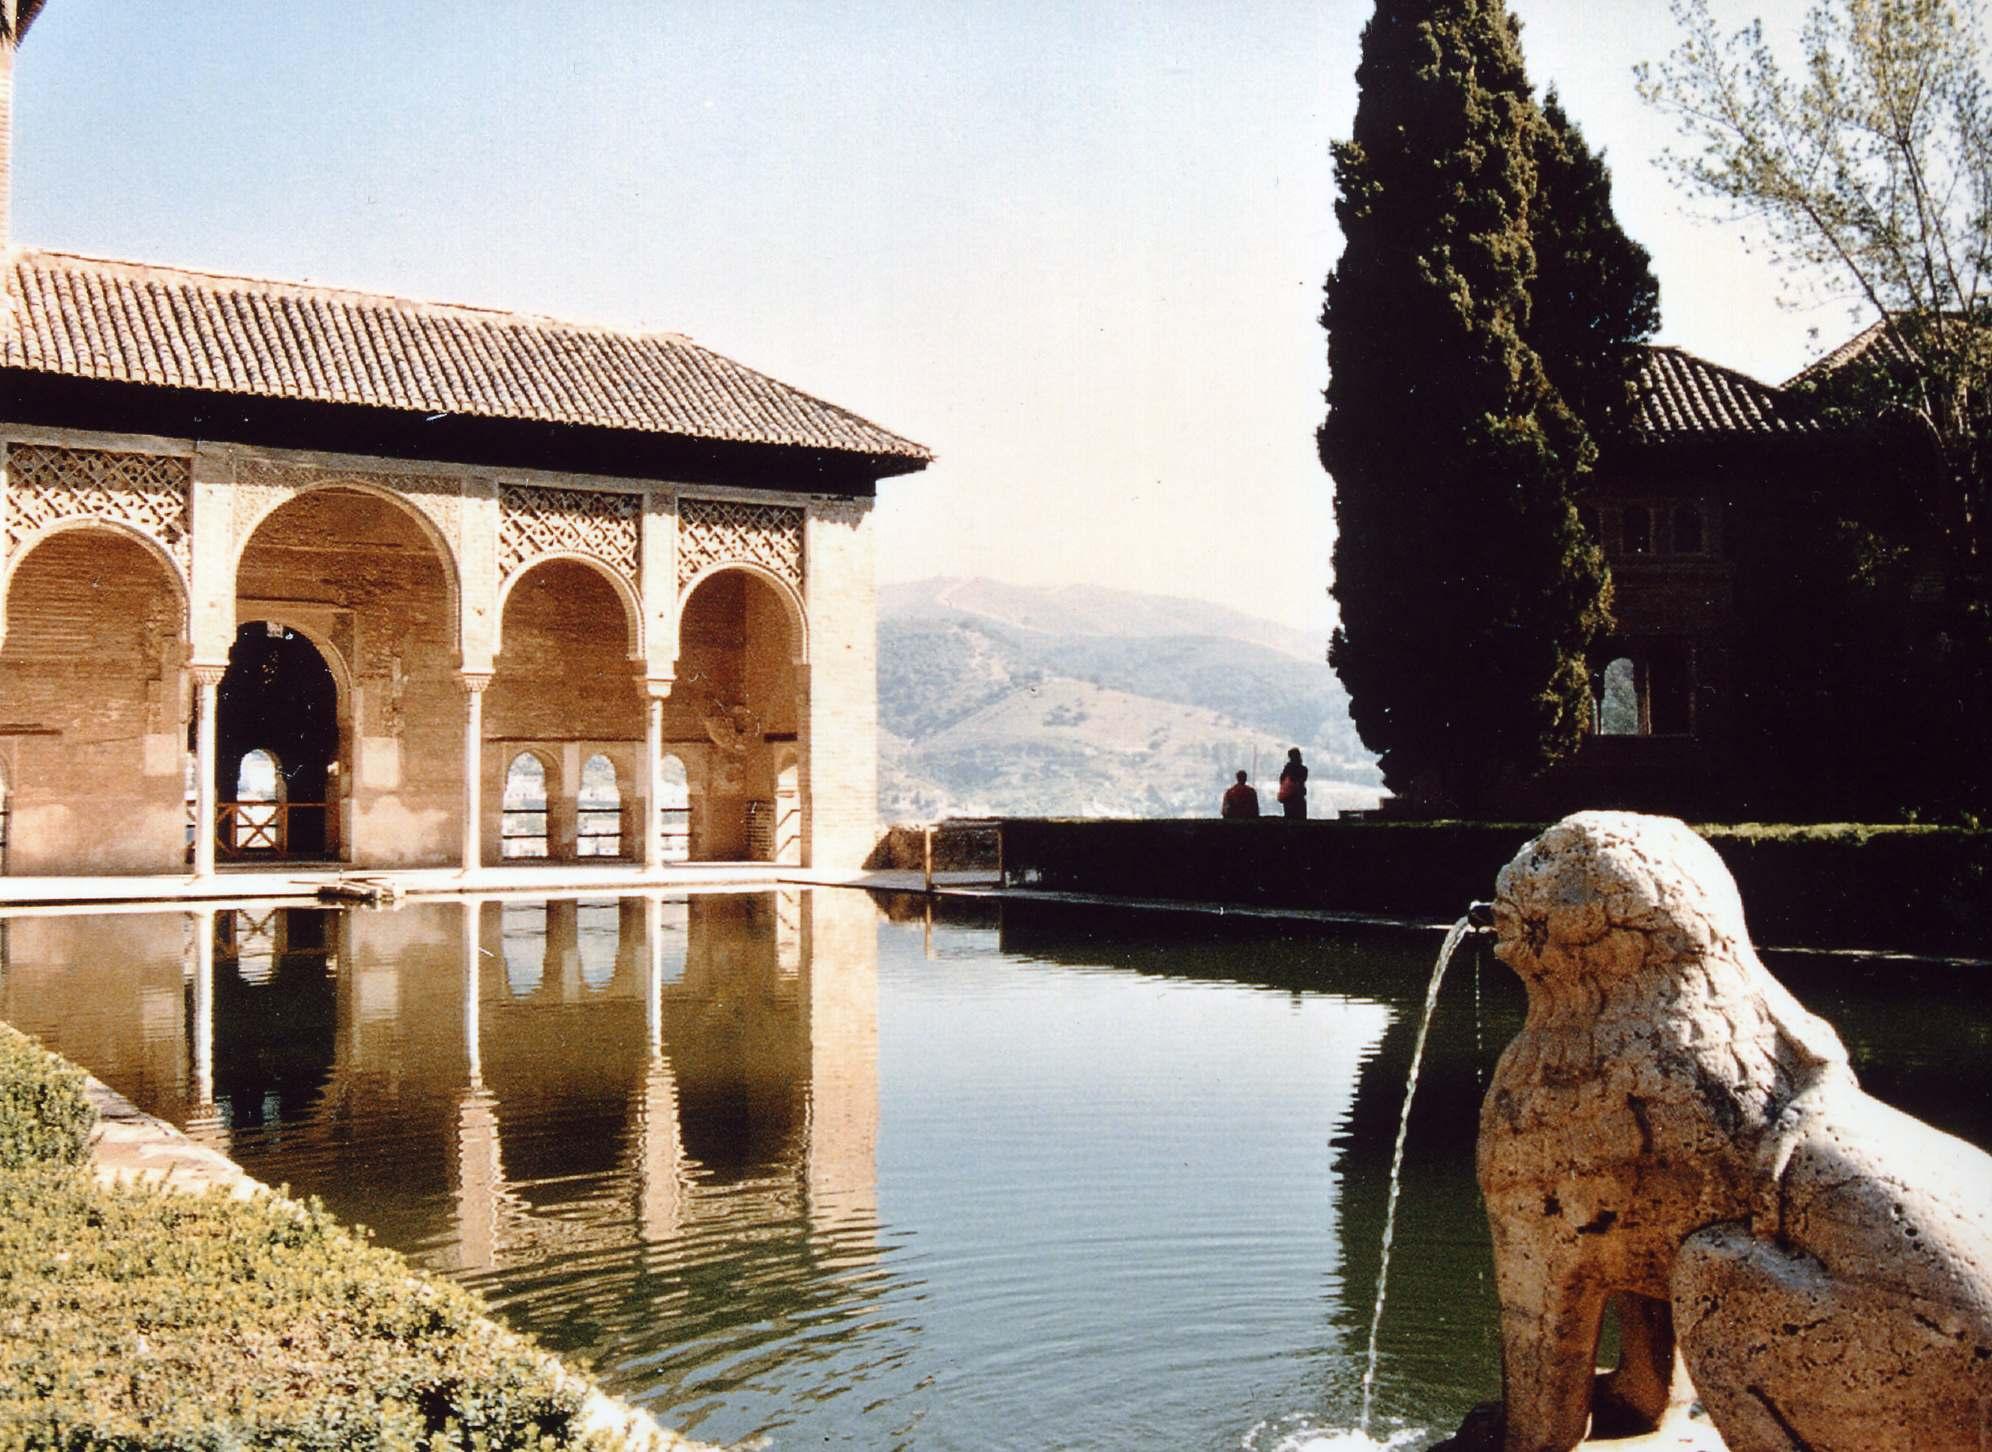 The pool at the Palacio del Partal